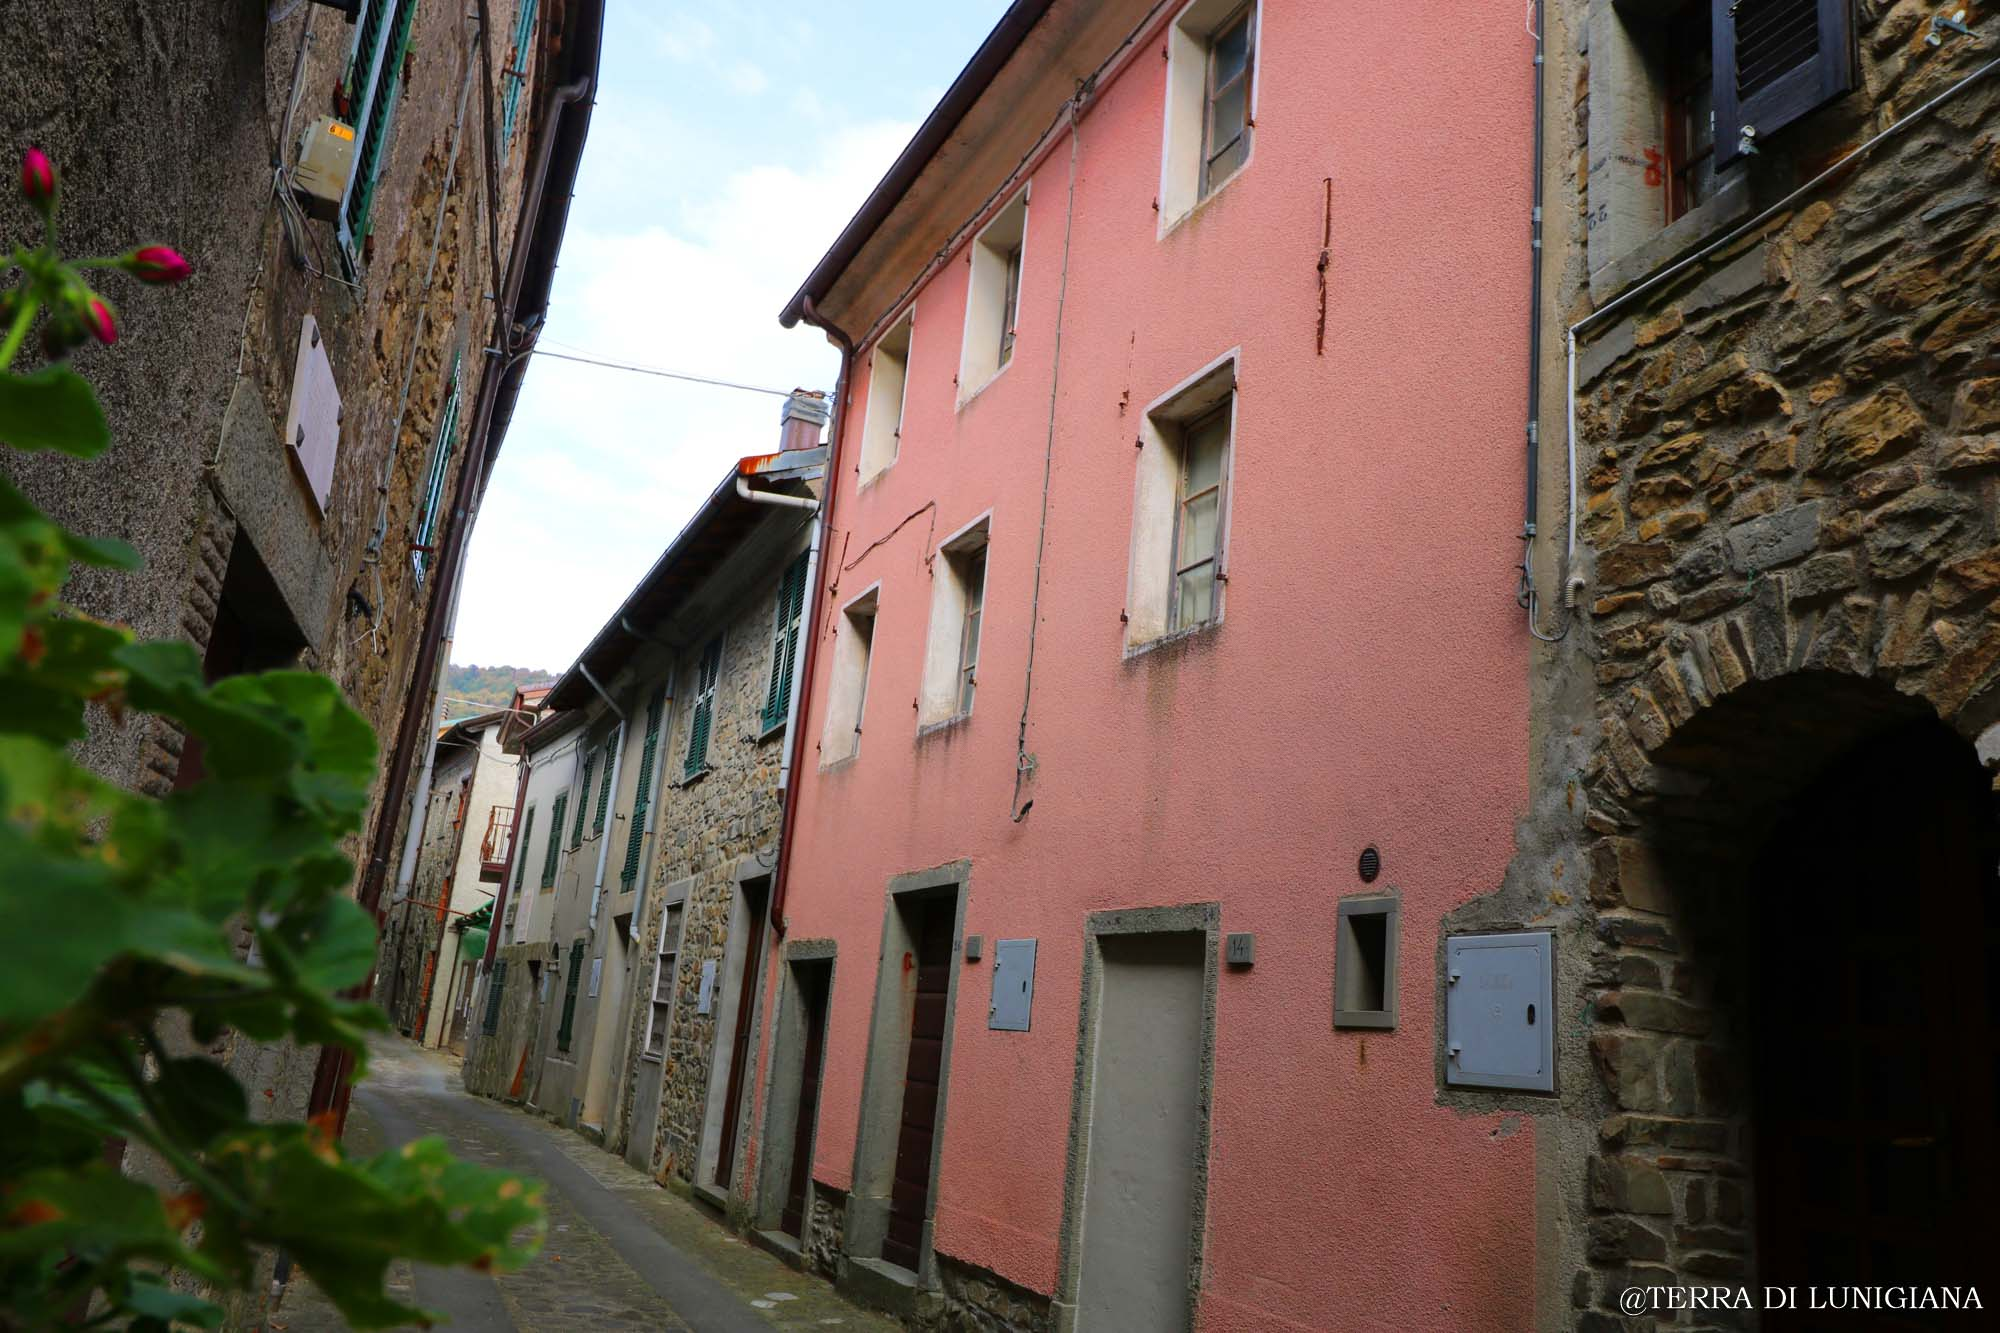 CASA DEGLI ANGELI – Ancient Historical House